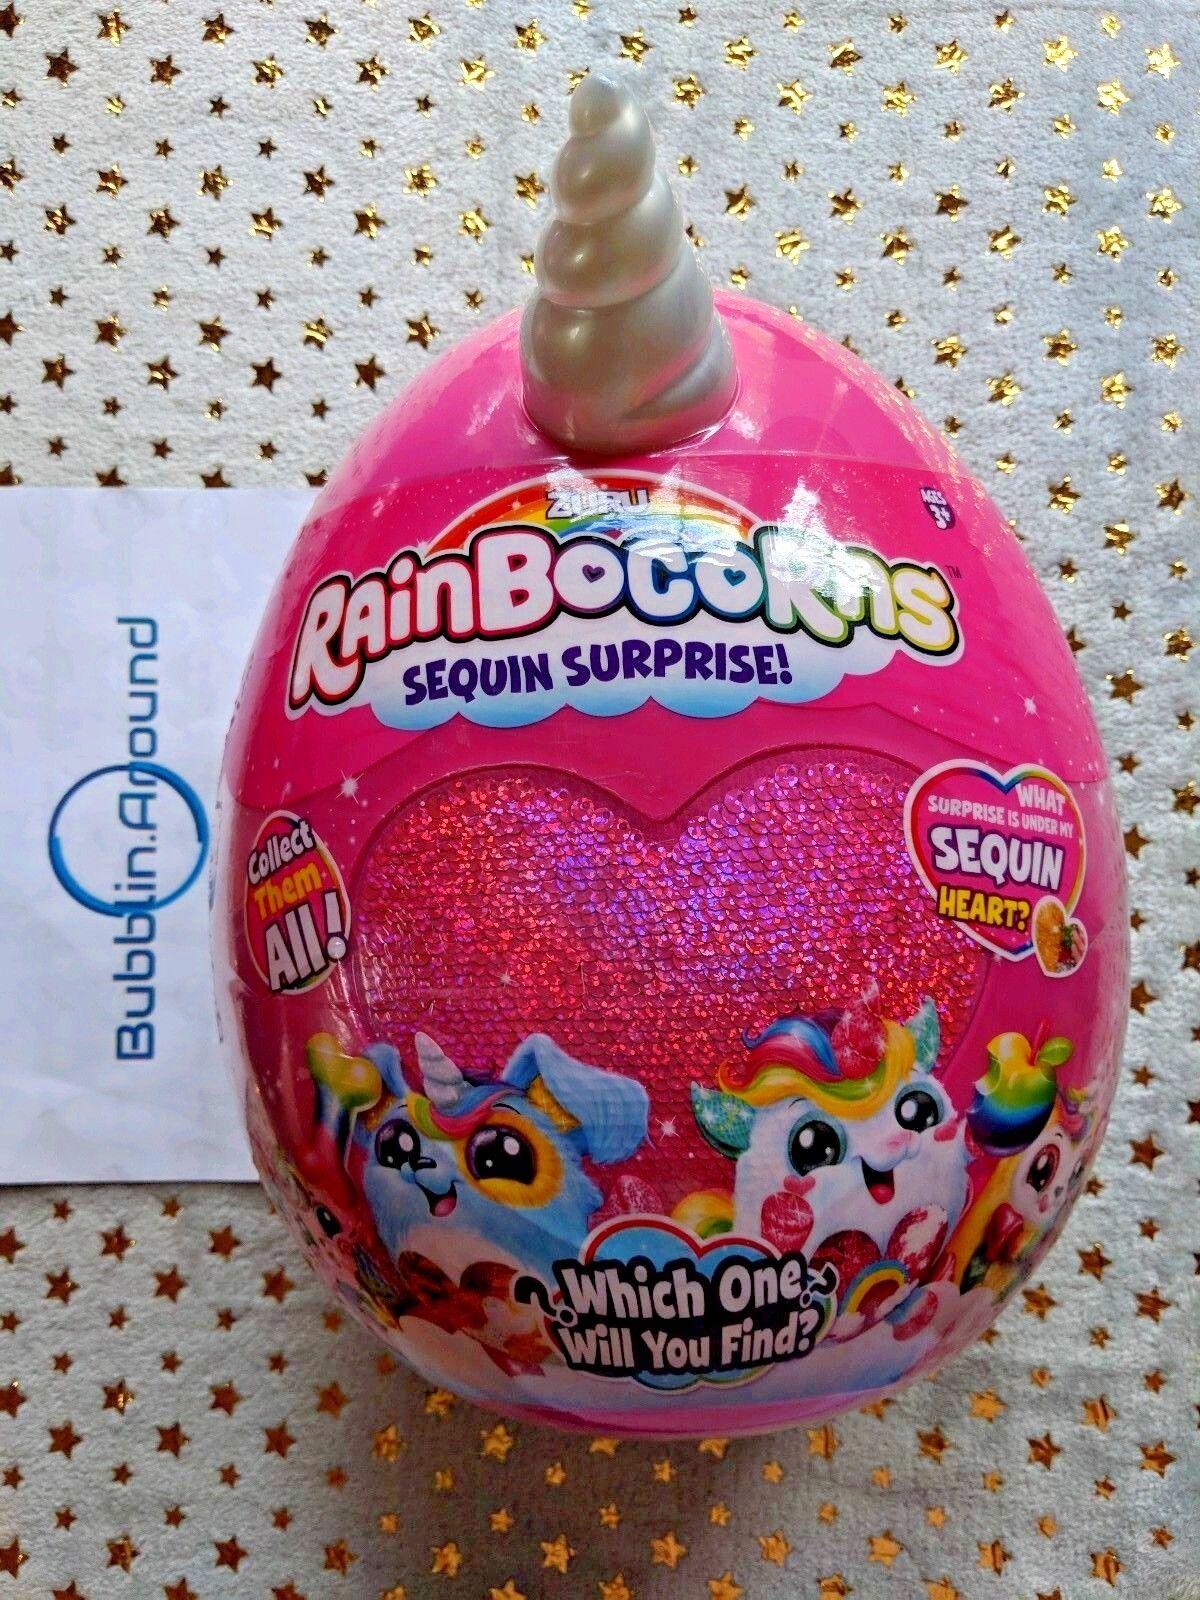 Rainbocorns Sequin Surprise - Sparkool - Hot Rosa Unicorn Rainbocorn